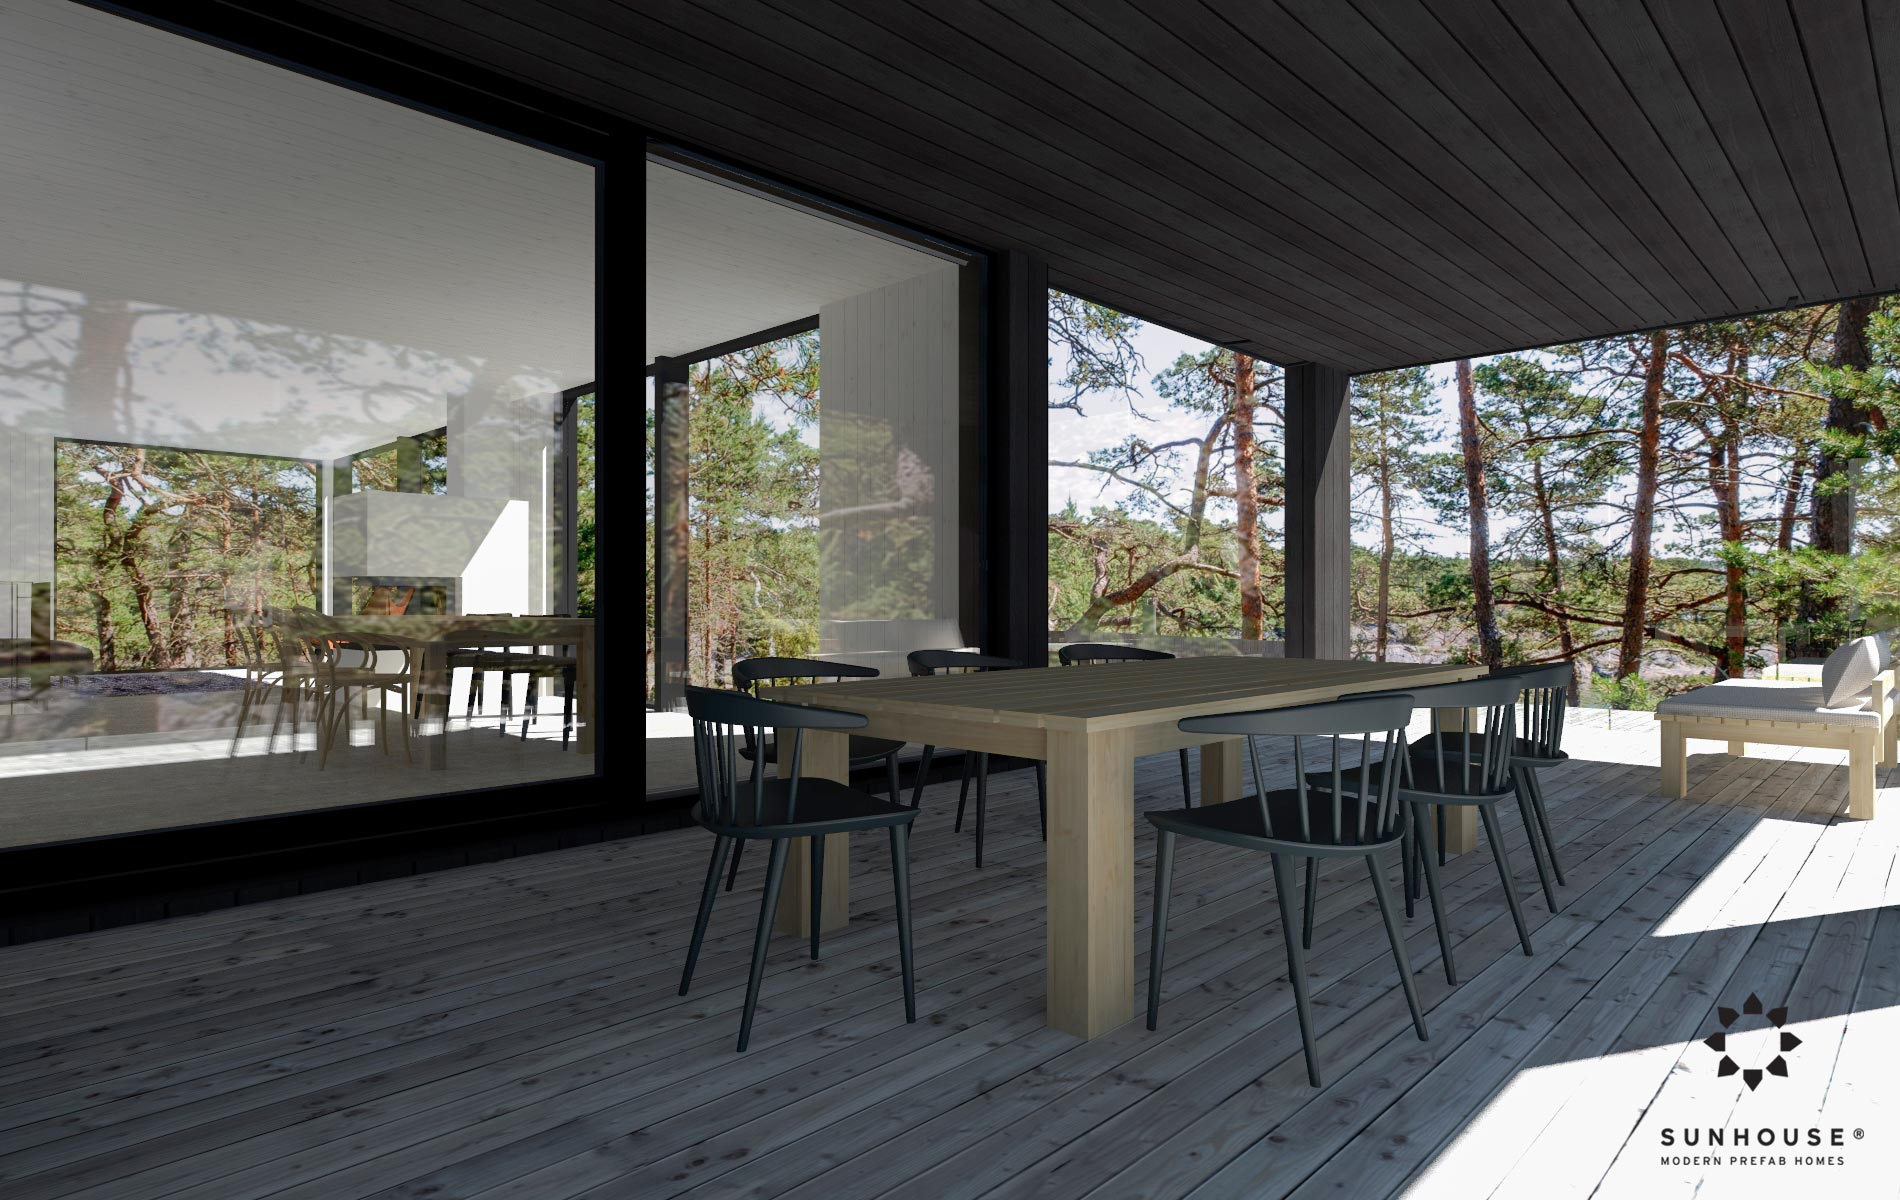 Sunhouse S200268 - Moderni puutalo